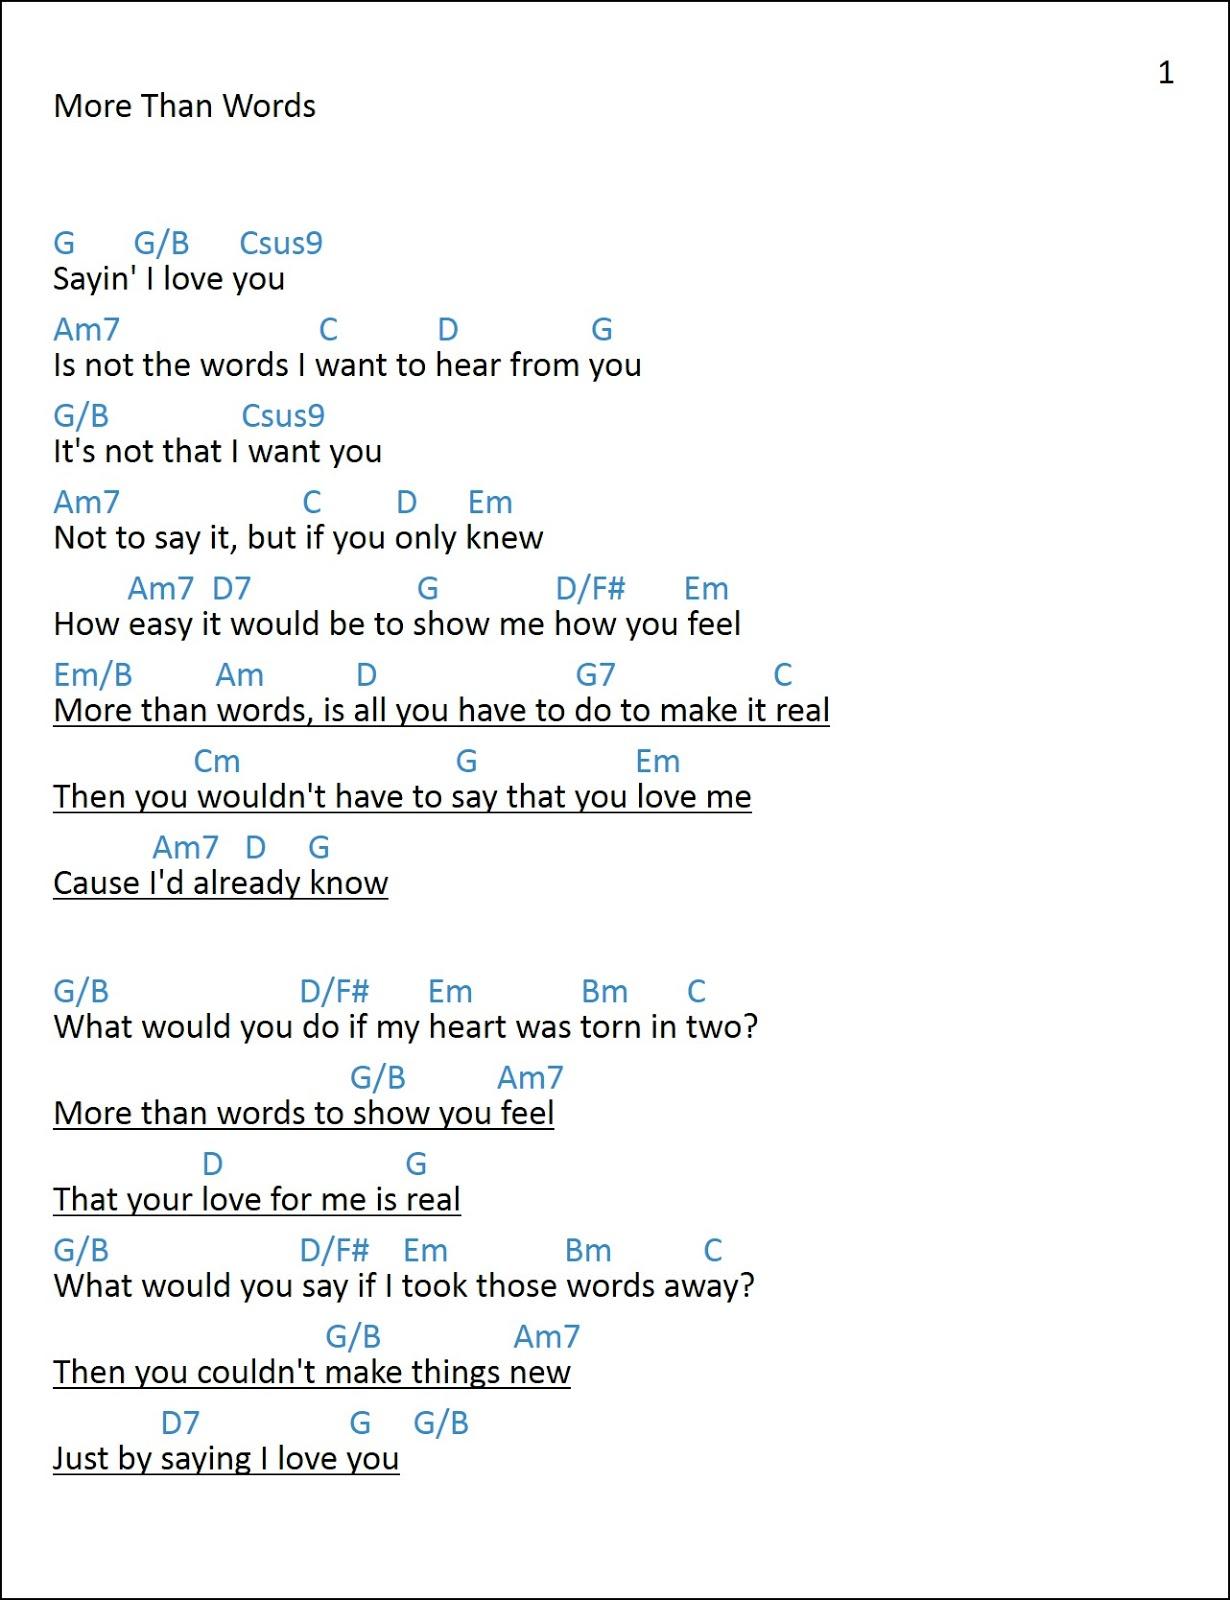 Just by saying i love you lyrics